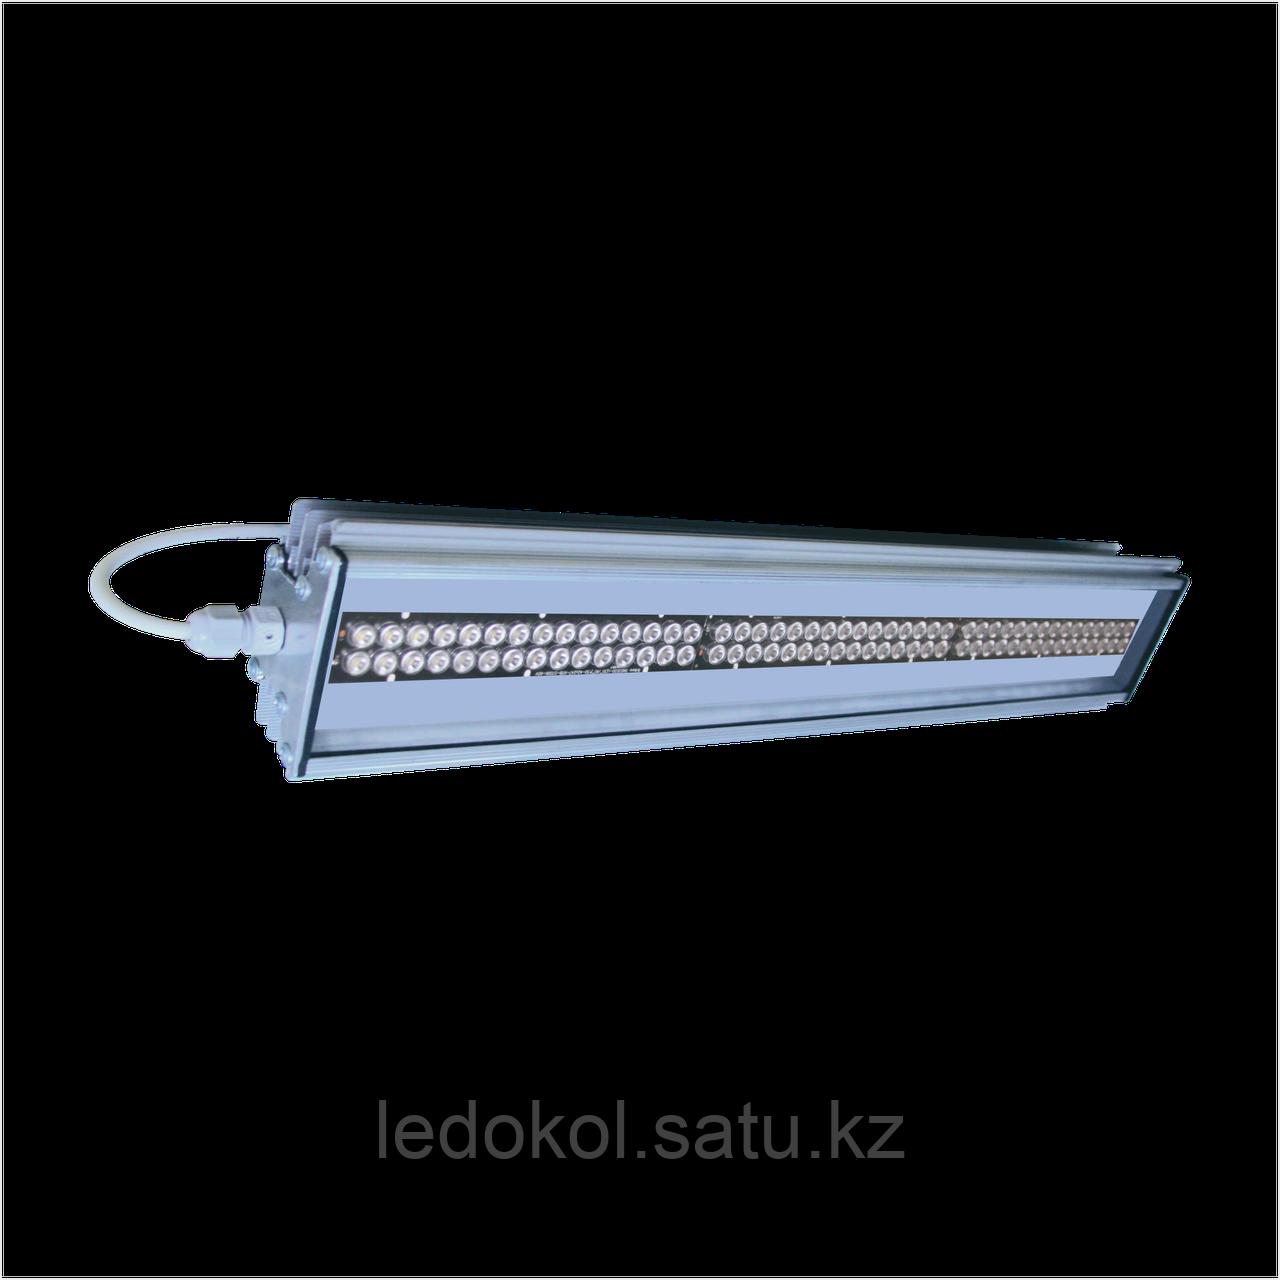 Прожектор 150W серии Спорт-Линзы